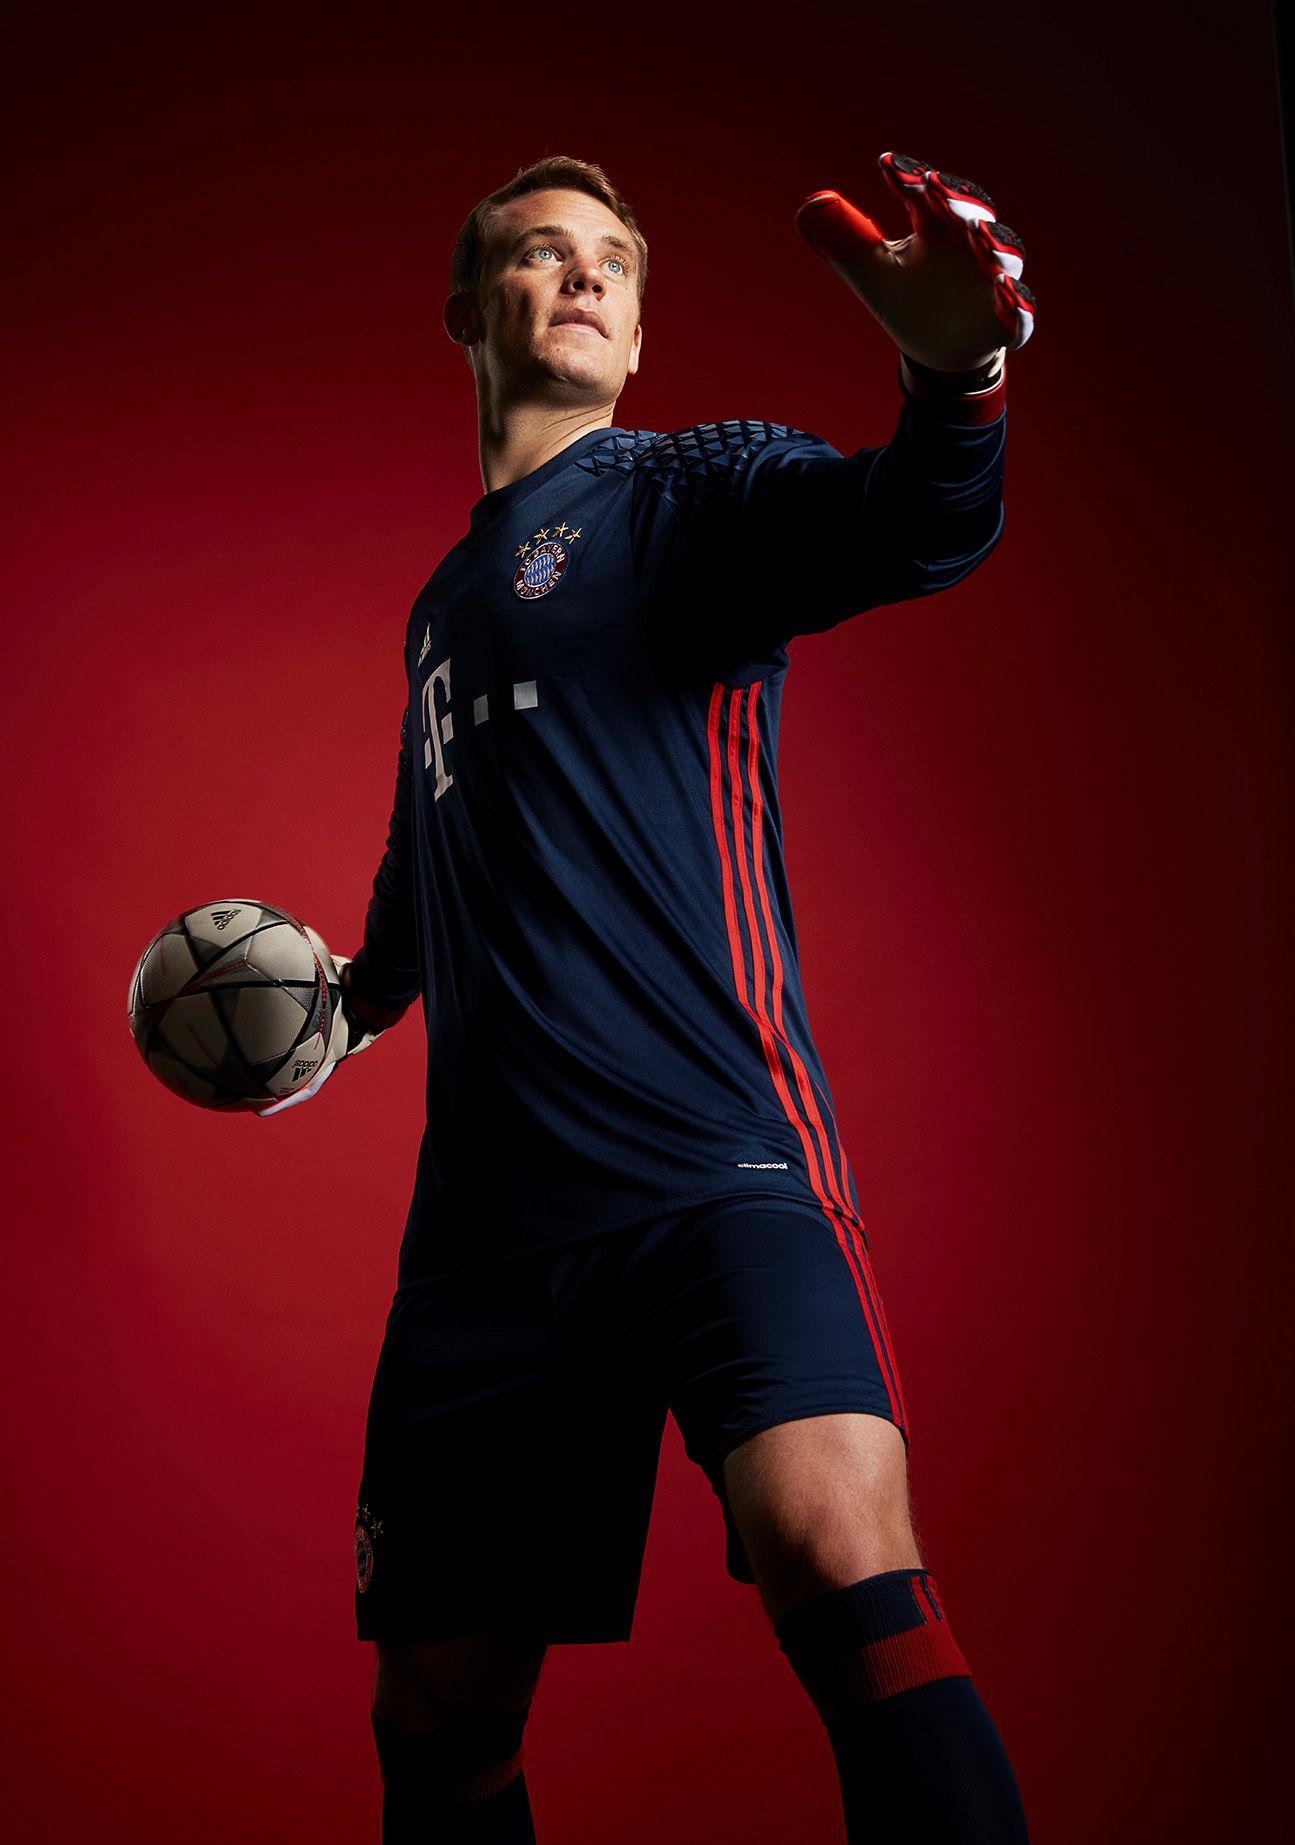 Fussball Bayern München